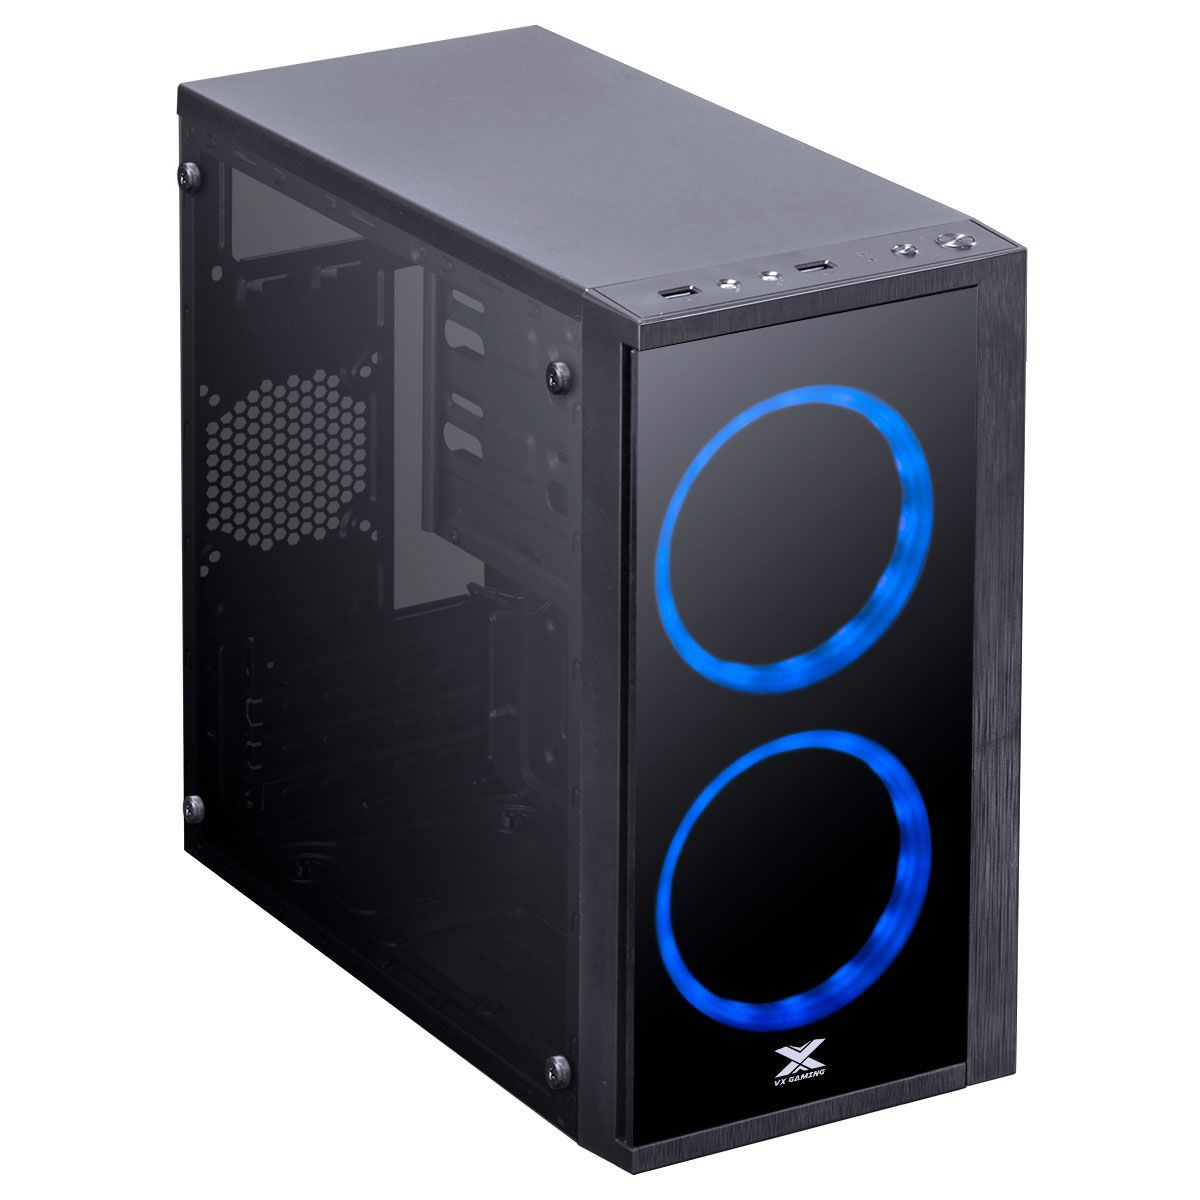 Gabinete Gamer VX Aries 2 Fan Frontal Led Azul 30711 - Vinik